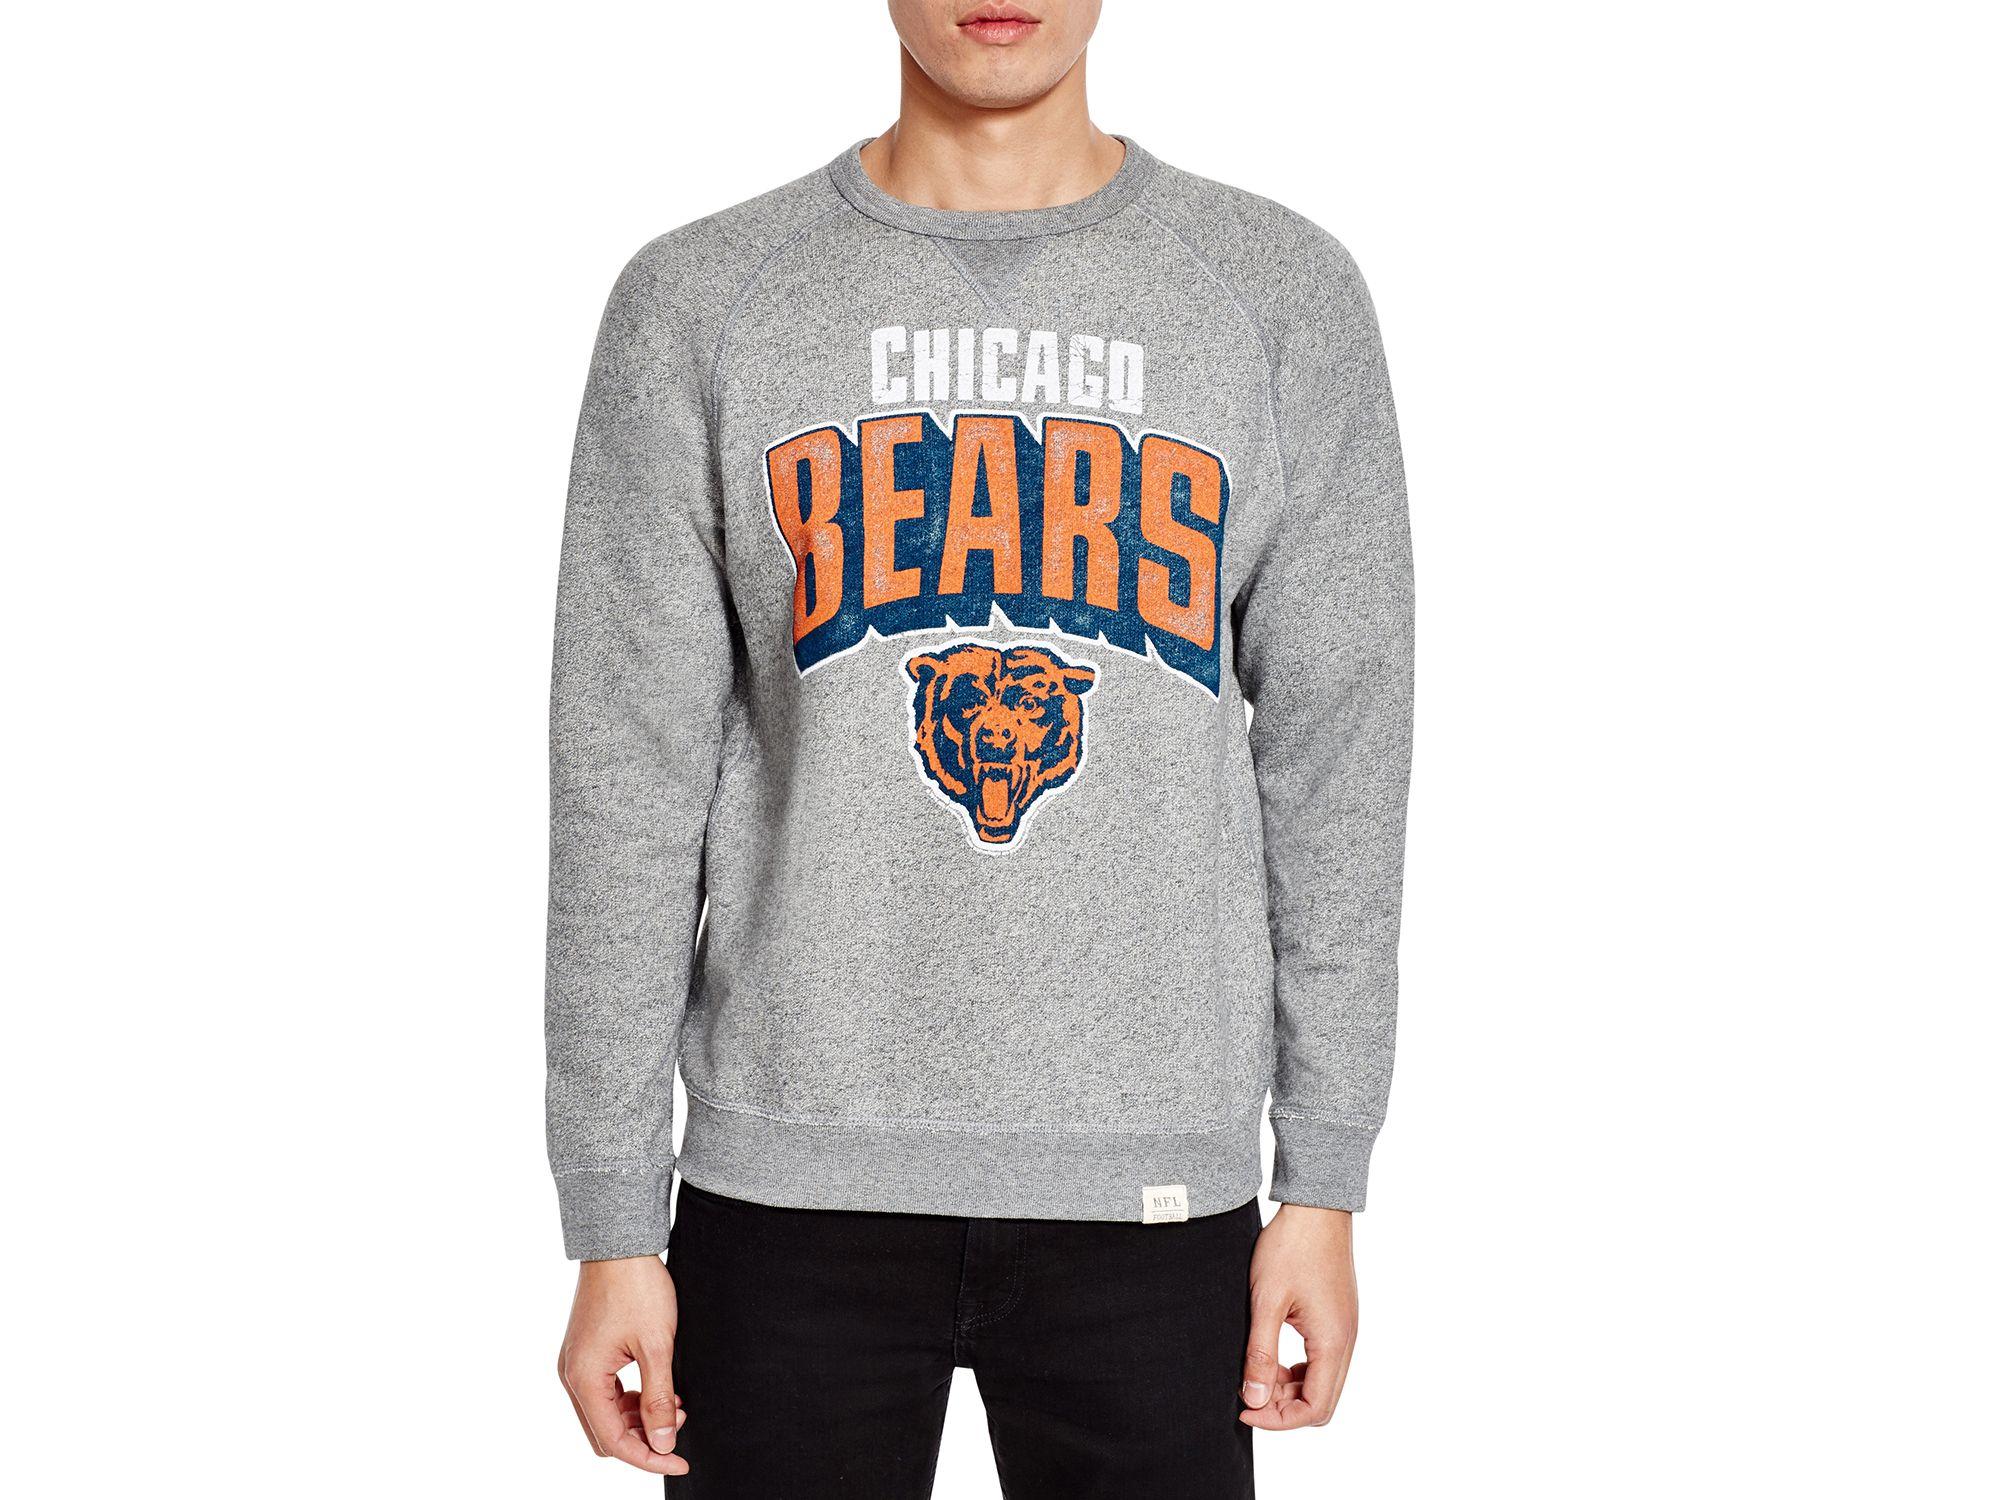 chicago bears grey sweatshirt